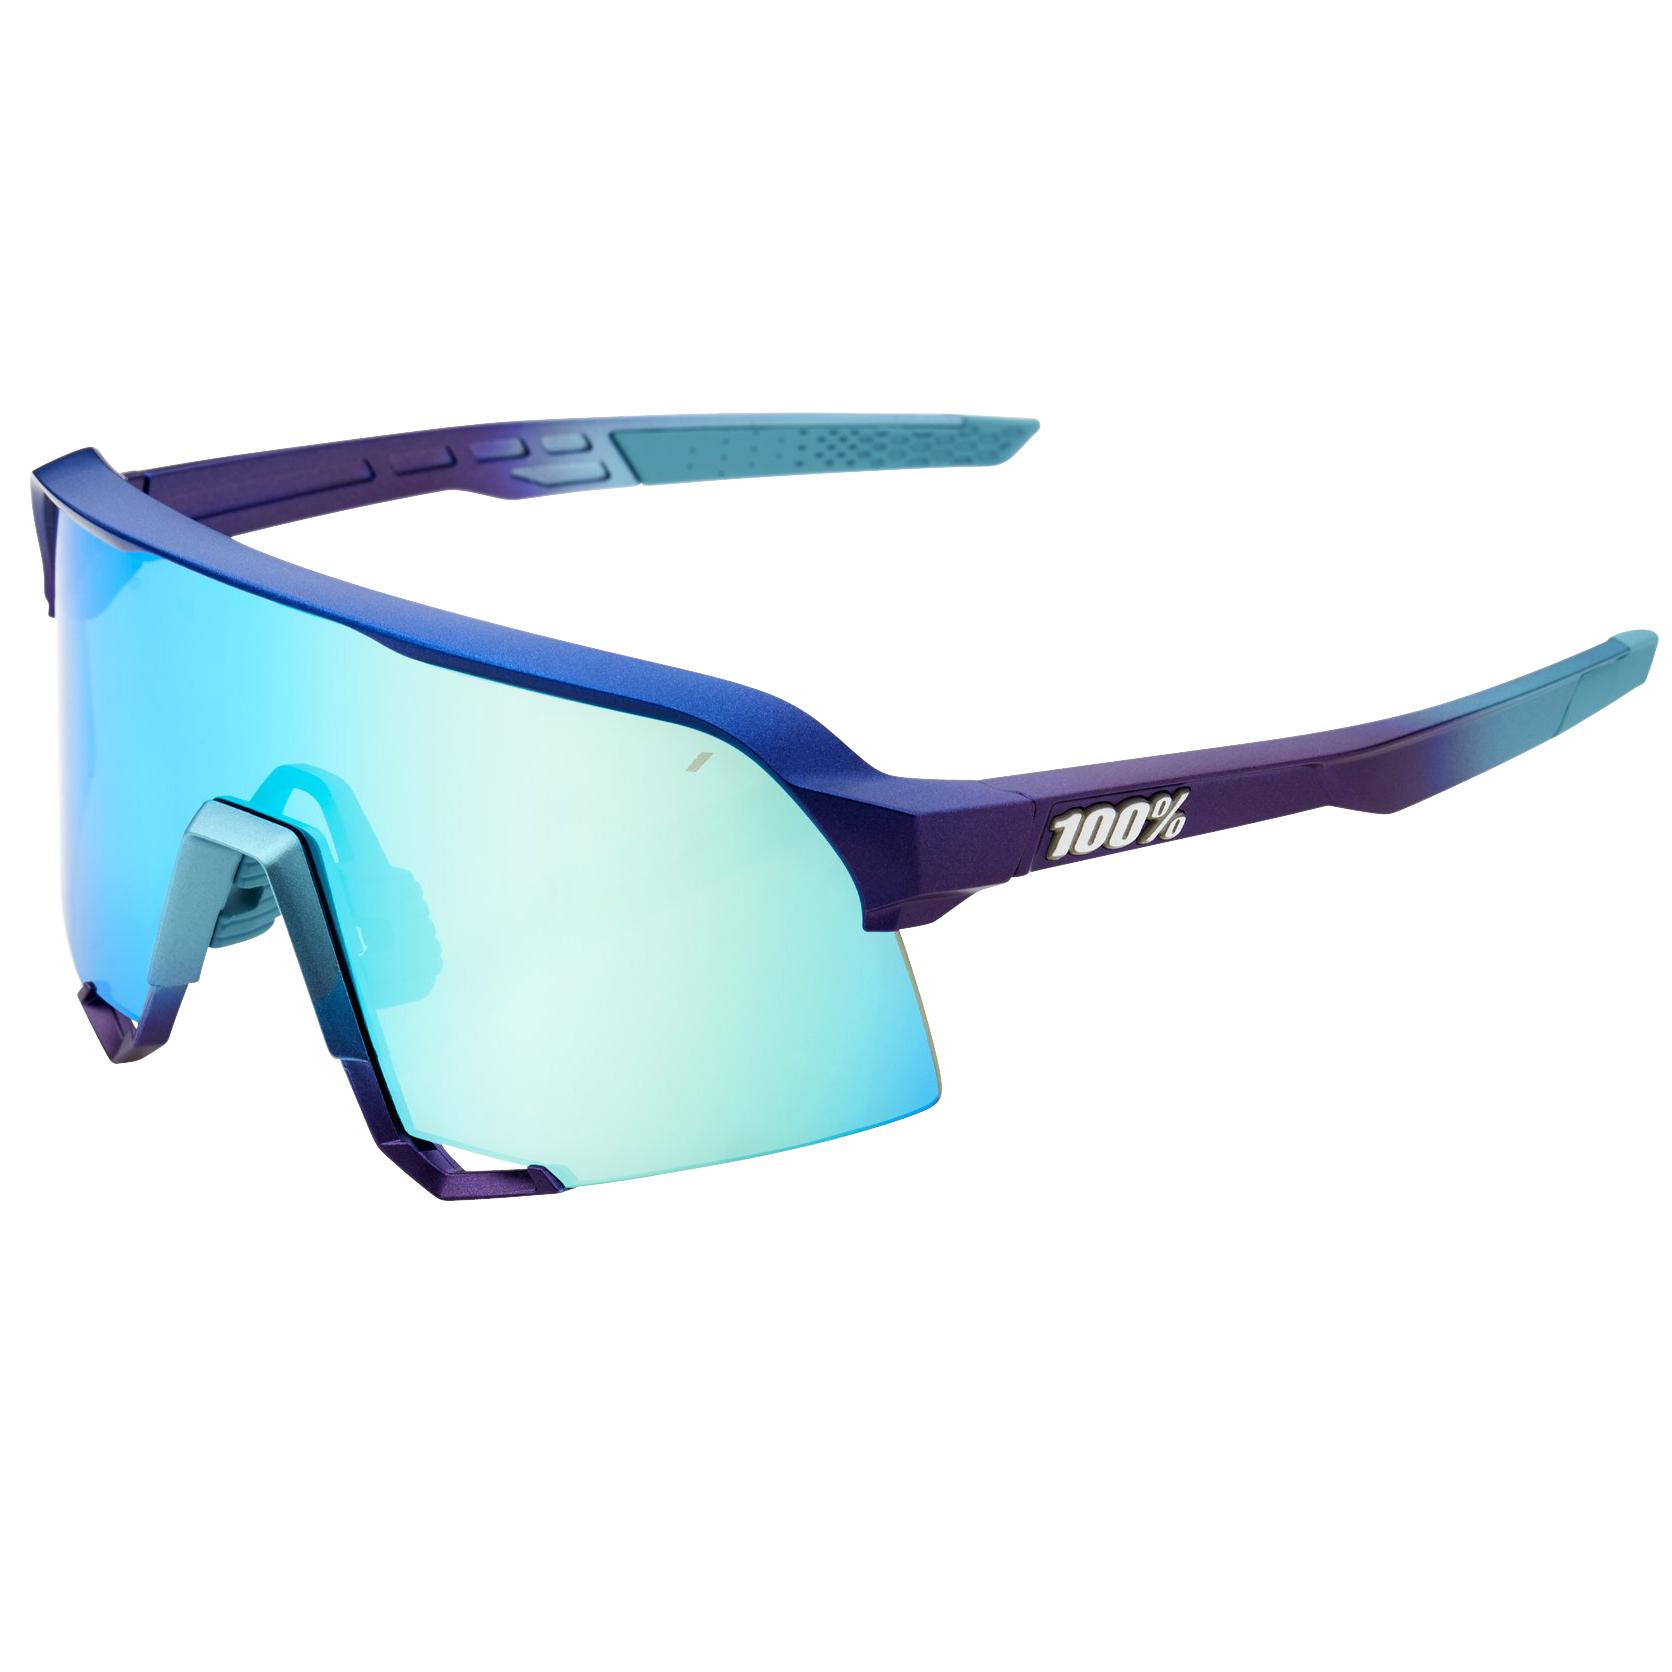 100% S3 Mirror Gafas - Matte Metallic Into the Fade/Blue Topaz Multilayer + Clear